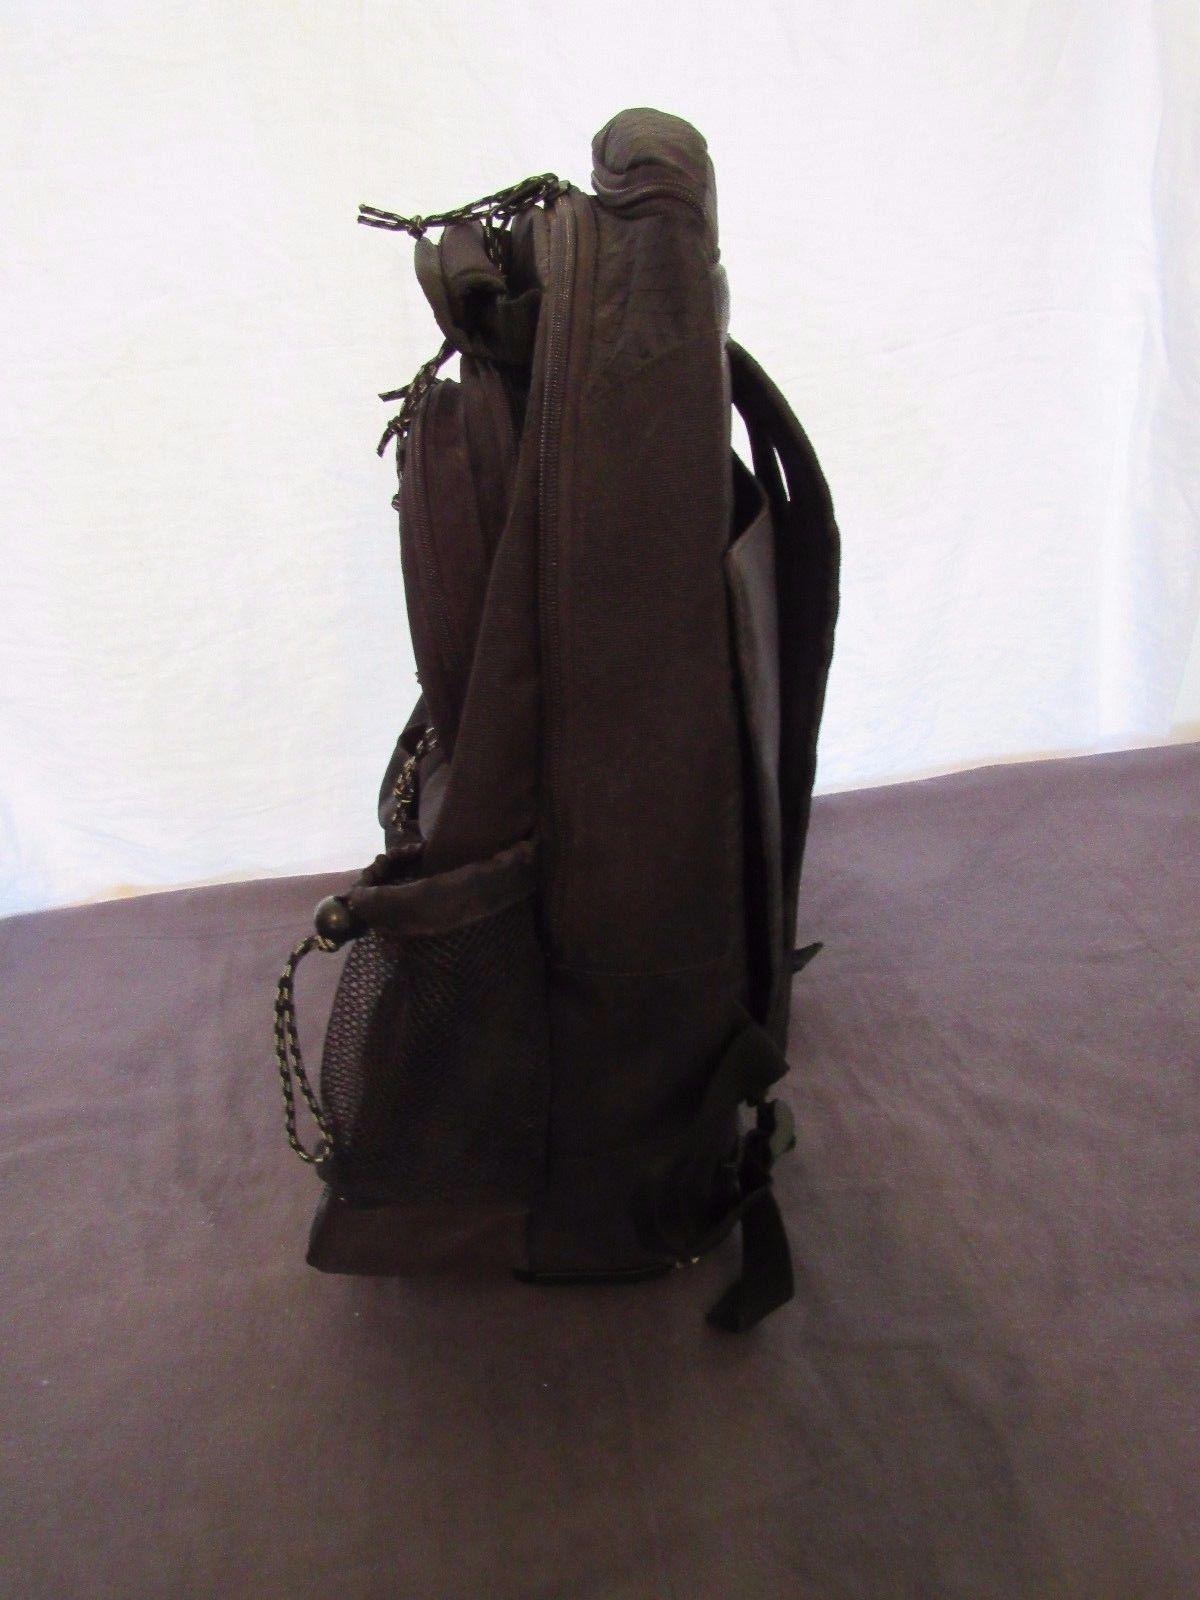 Rolling Backpack for Laptop Extending Handle Wheeled Bag Targus Business Travel